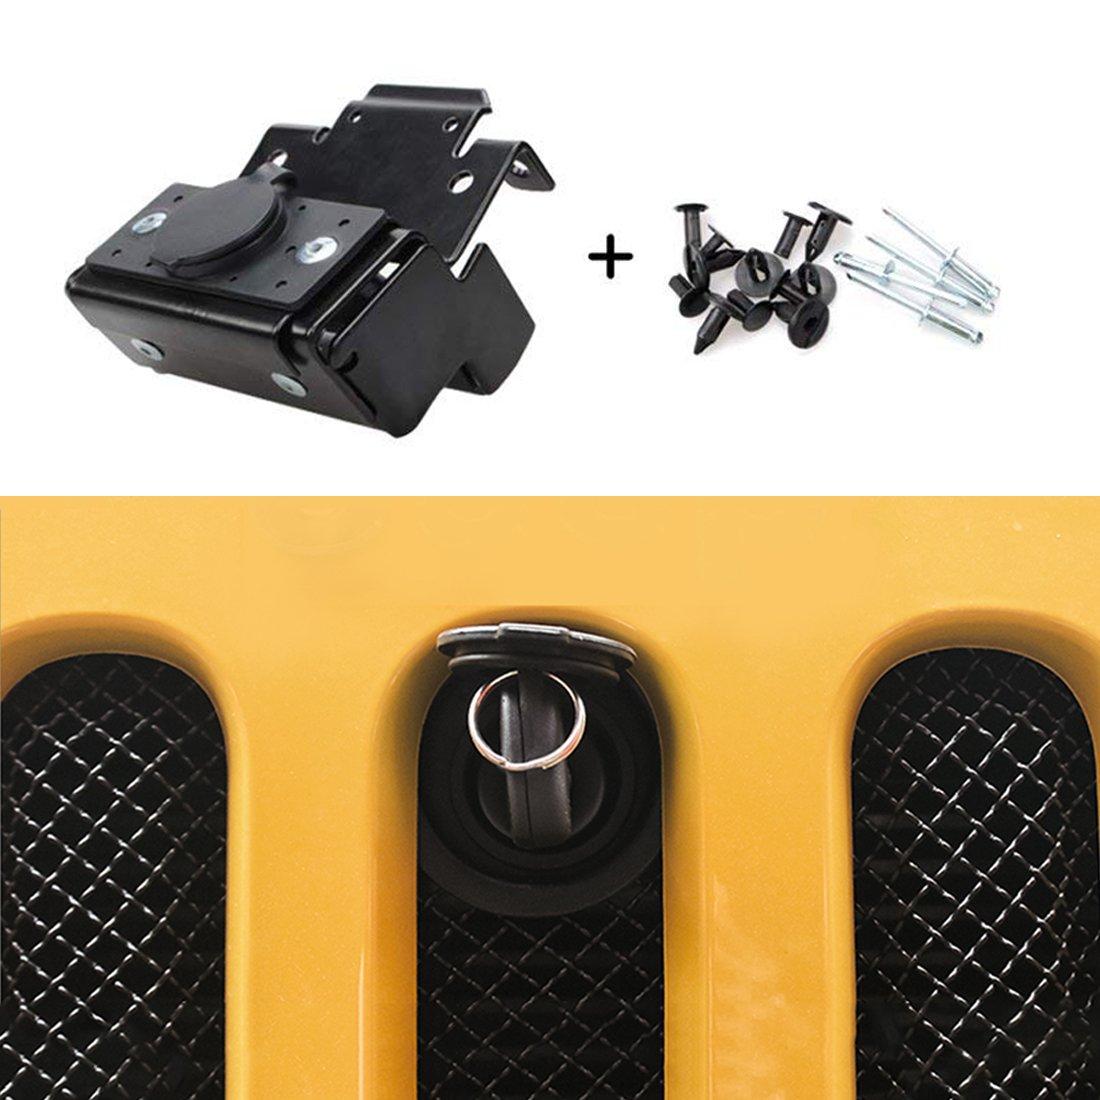 E-cowlboy Hood Lock Anti-Theft Alarm System Kit Assembly For 2007-2018 Jeep Wrangler JK JKU 2WD 4WD 82213051-AB QI-845